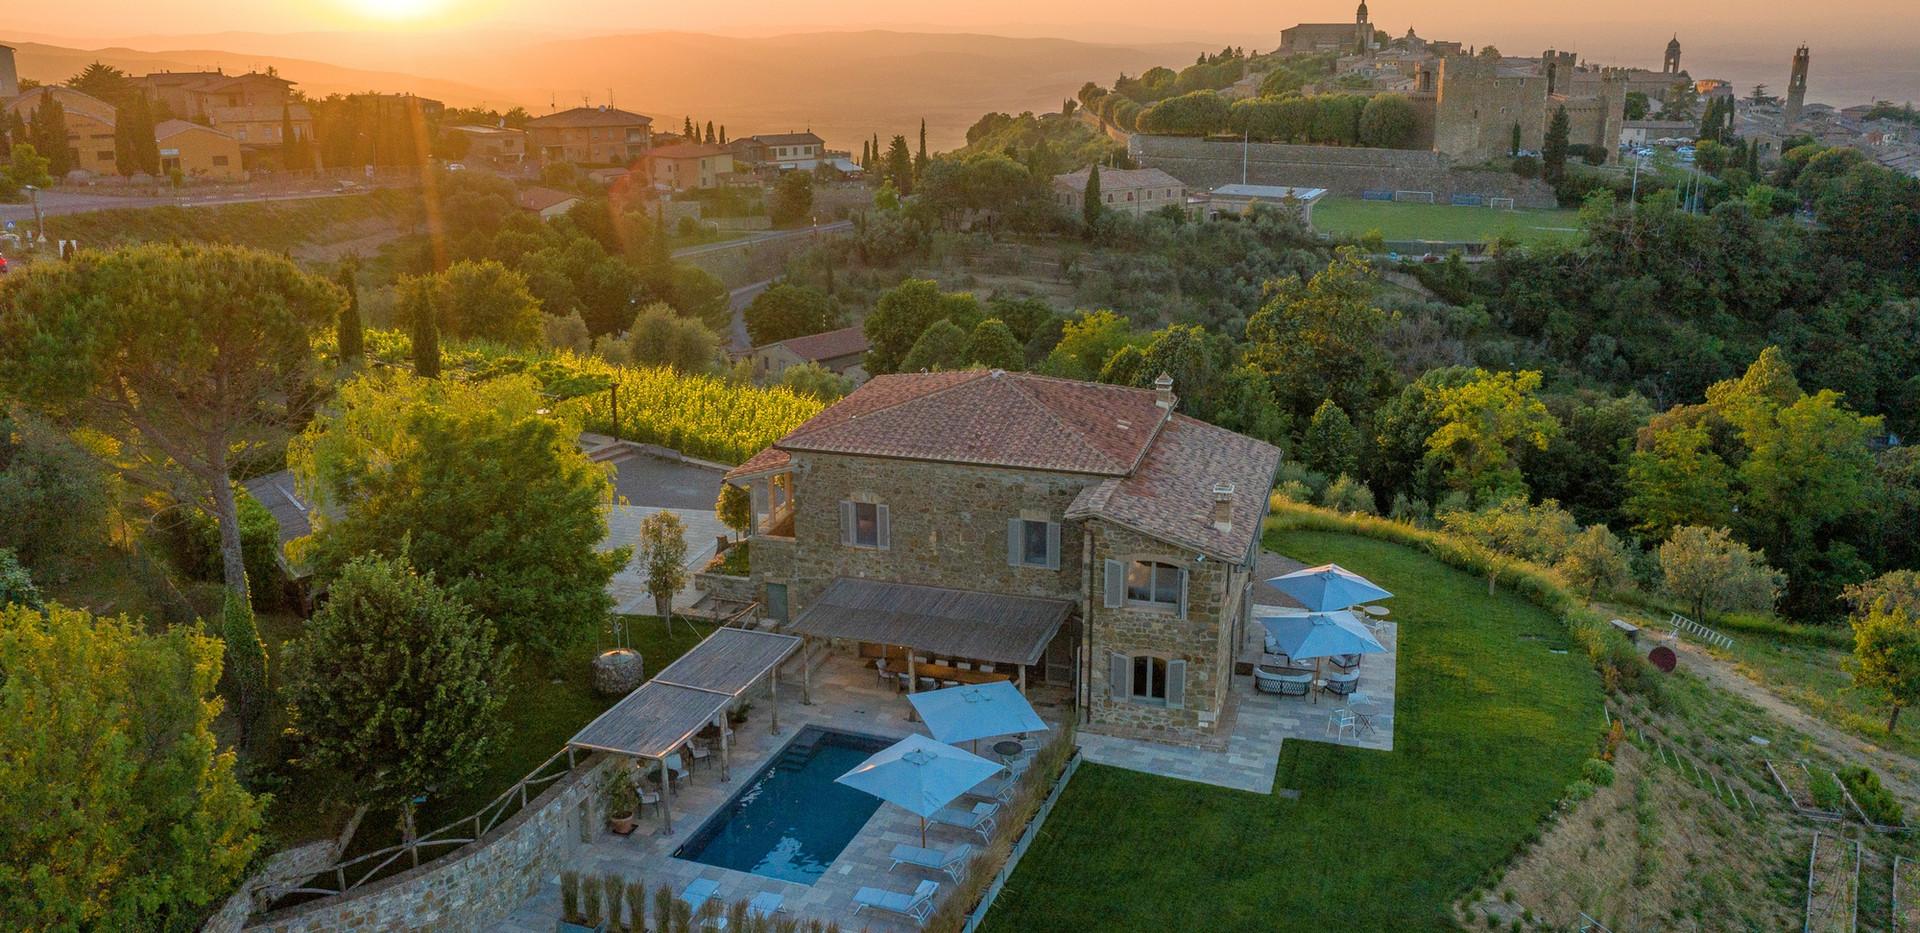 WEB Villa Palazzetta, Montalcino 2019-09